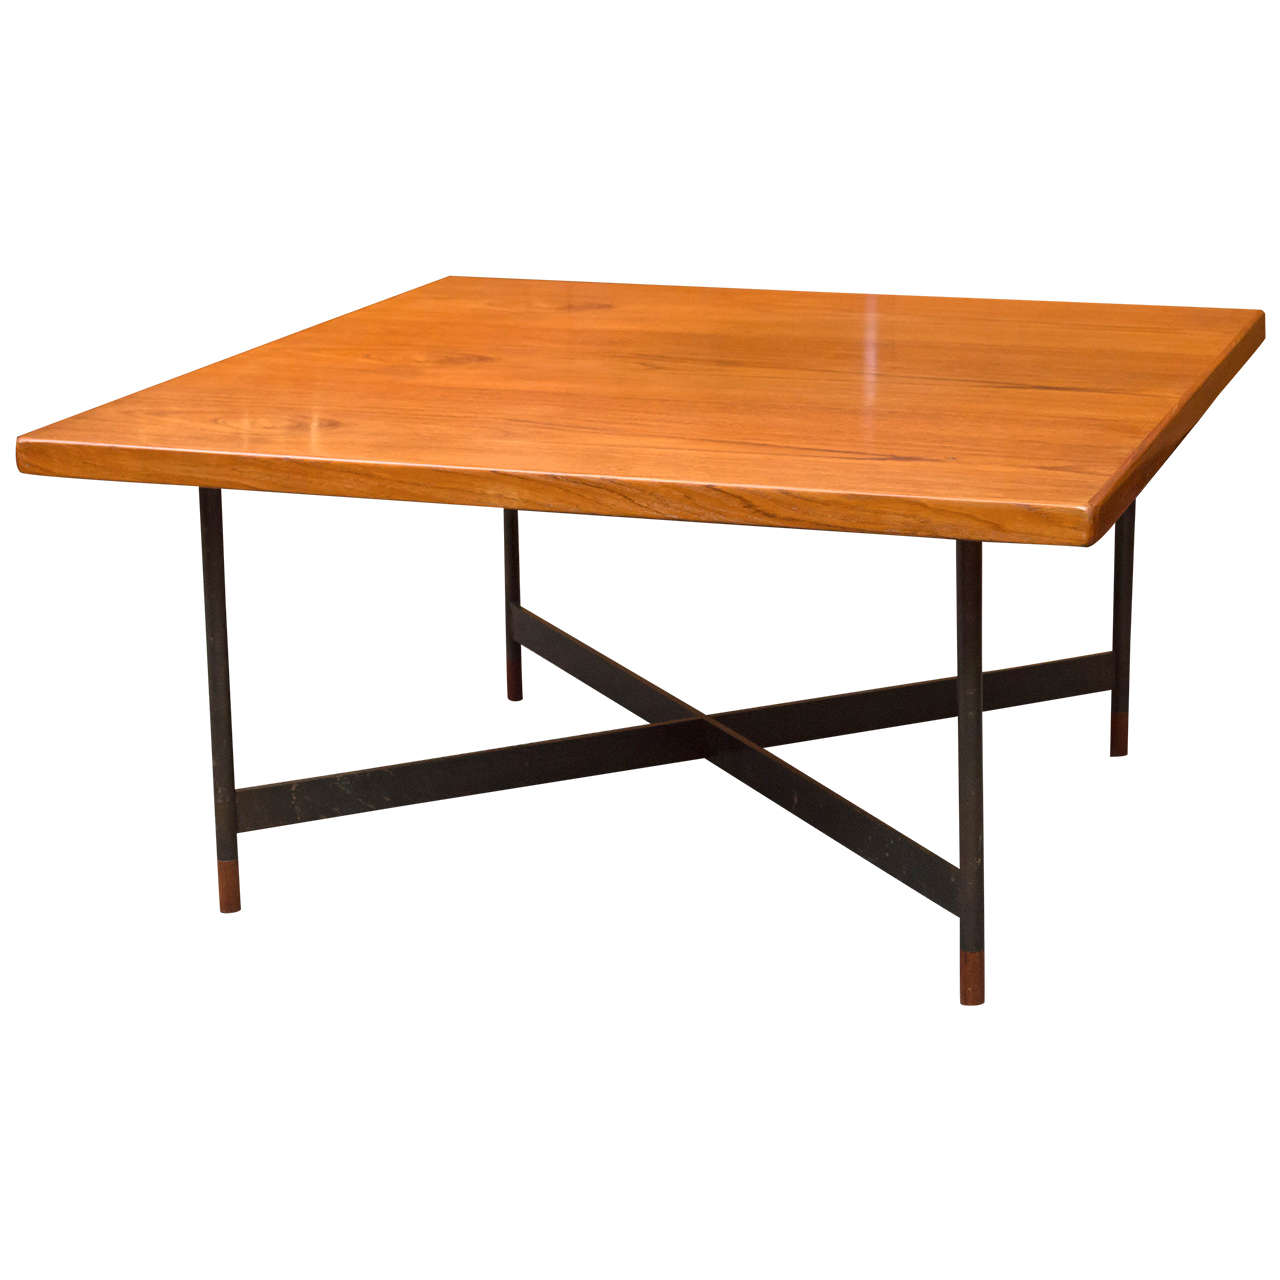 Rare Finn Juhl Coffee Table